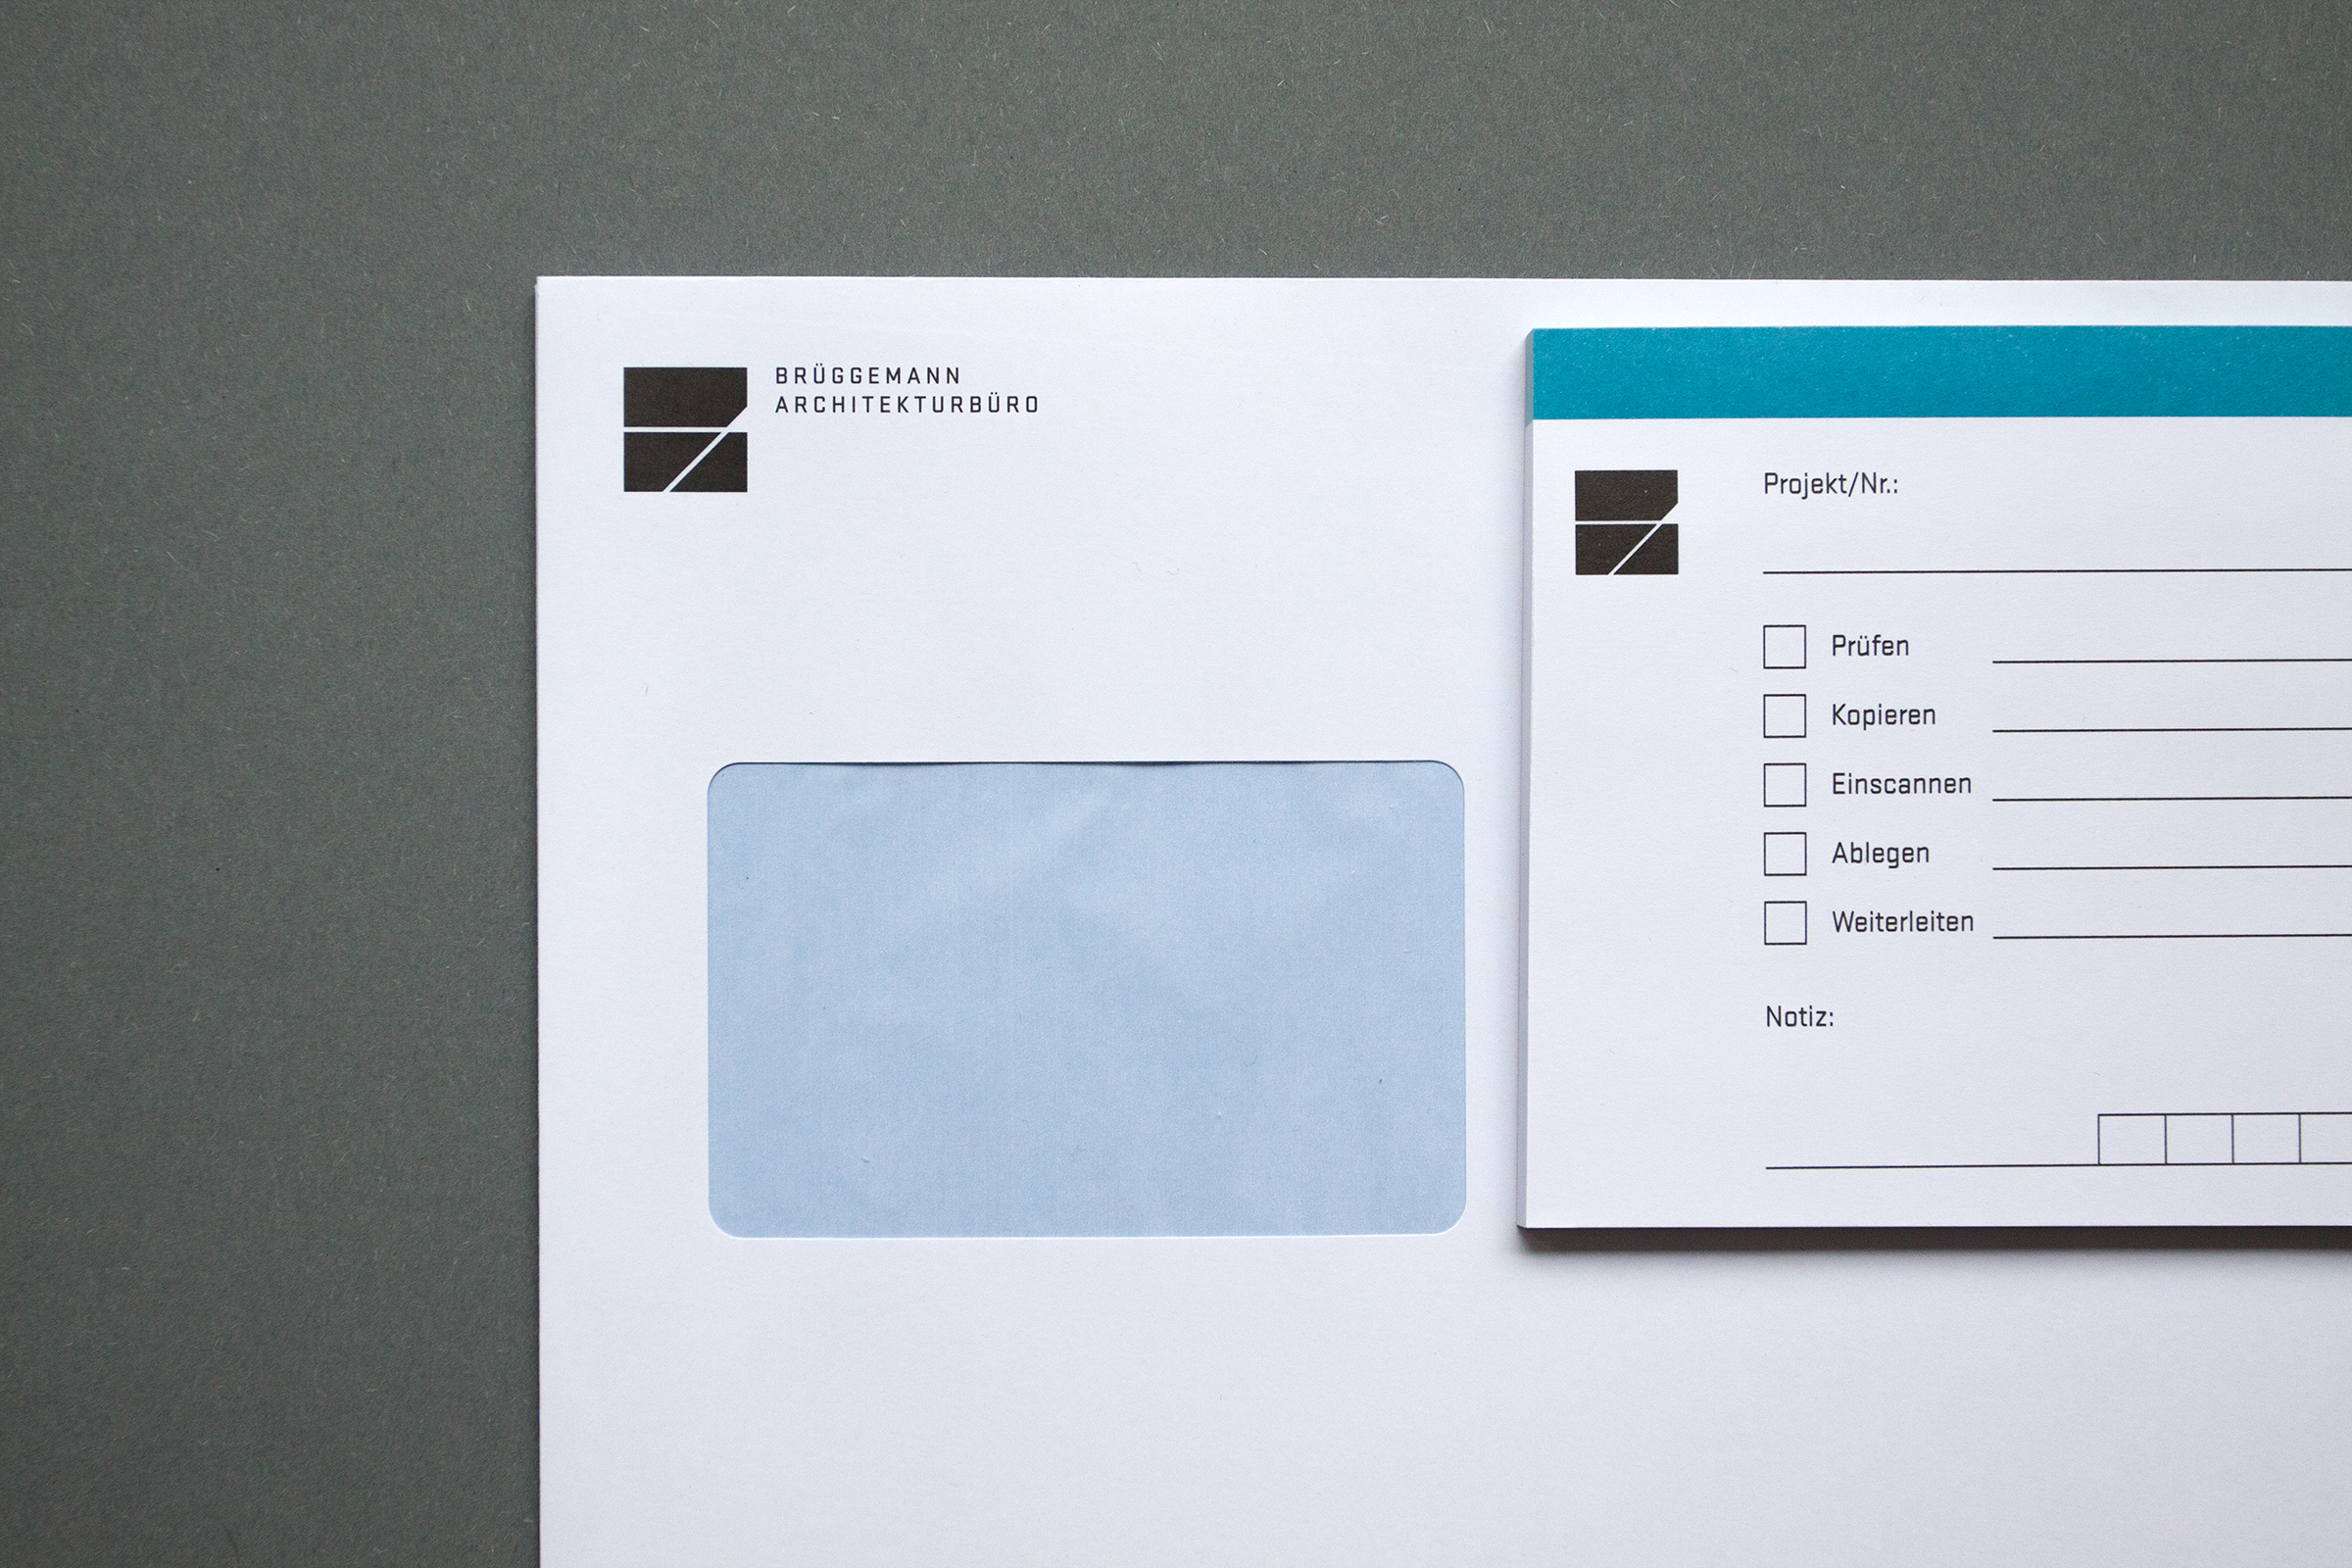 bra-bueroink-stationery-design-3682